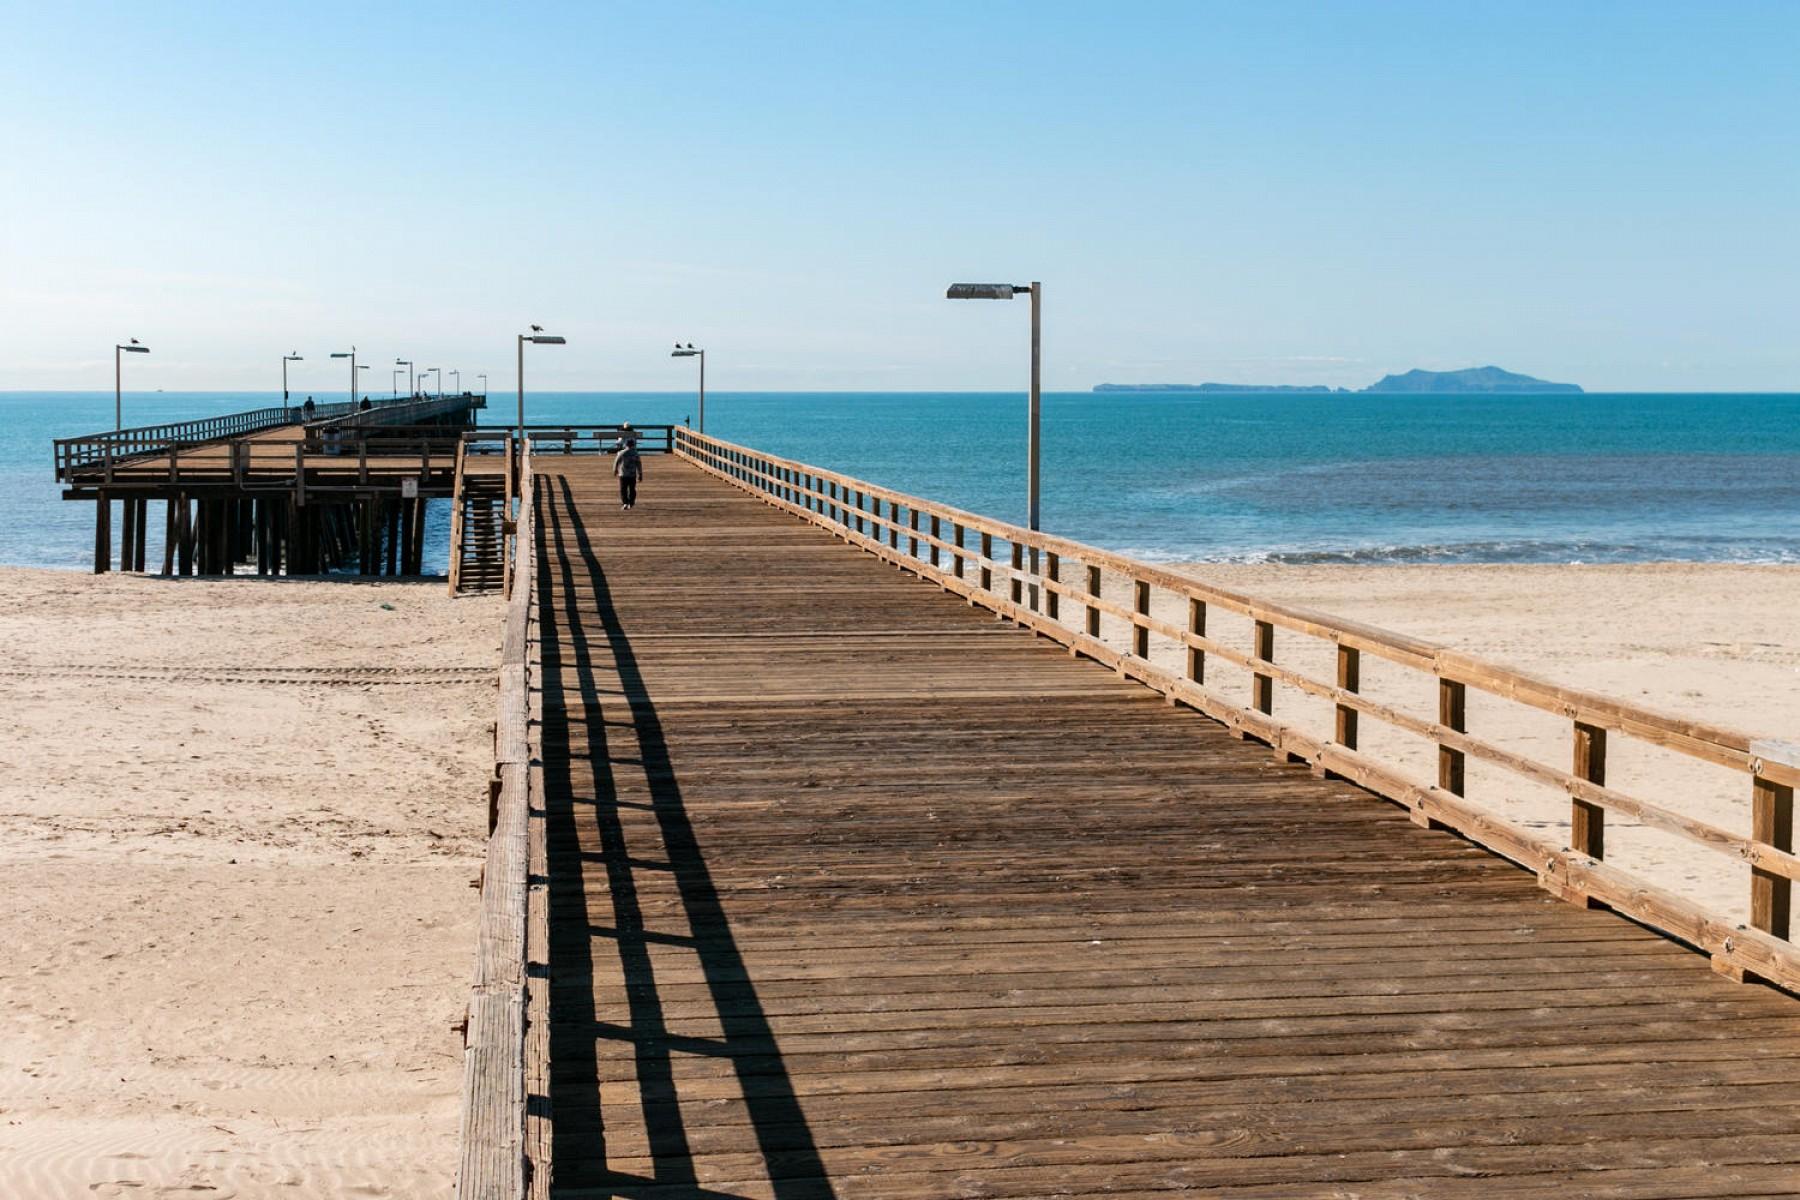 201 South Ventura Road, Unit 15, Port Hueneme, CA 93041